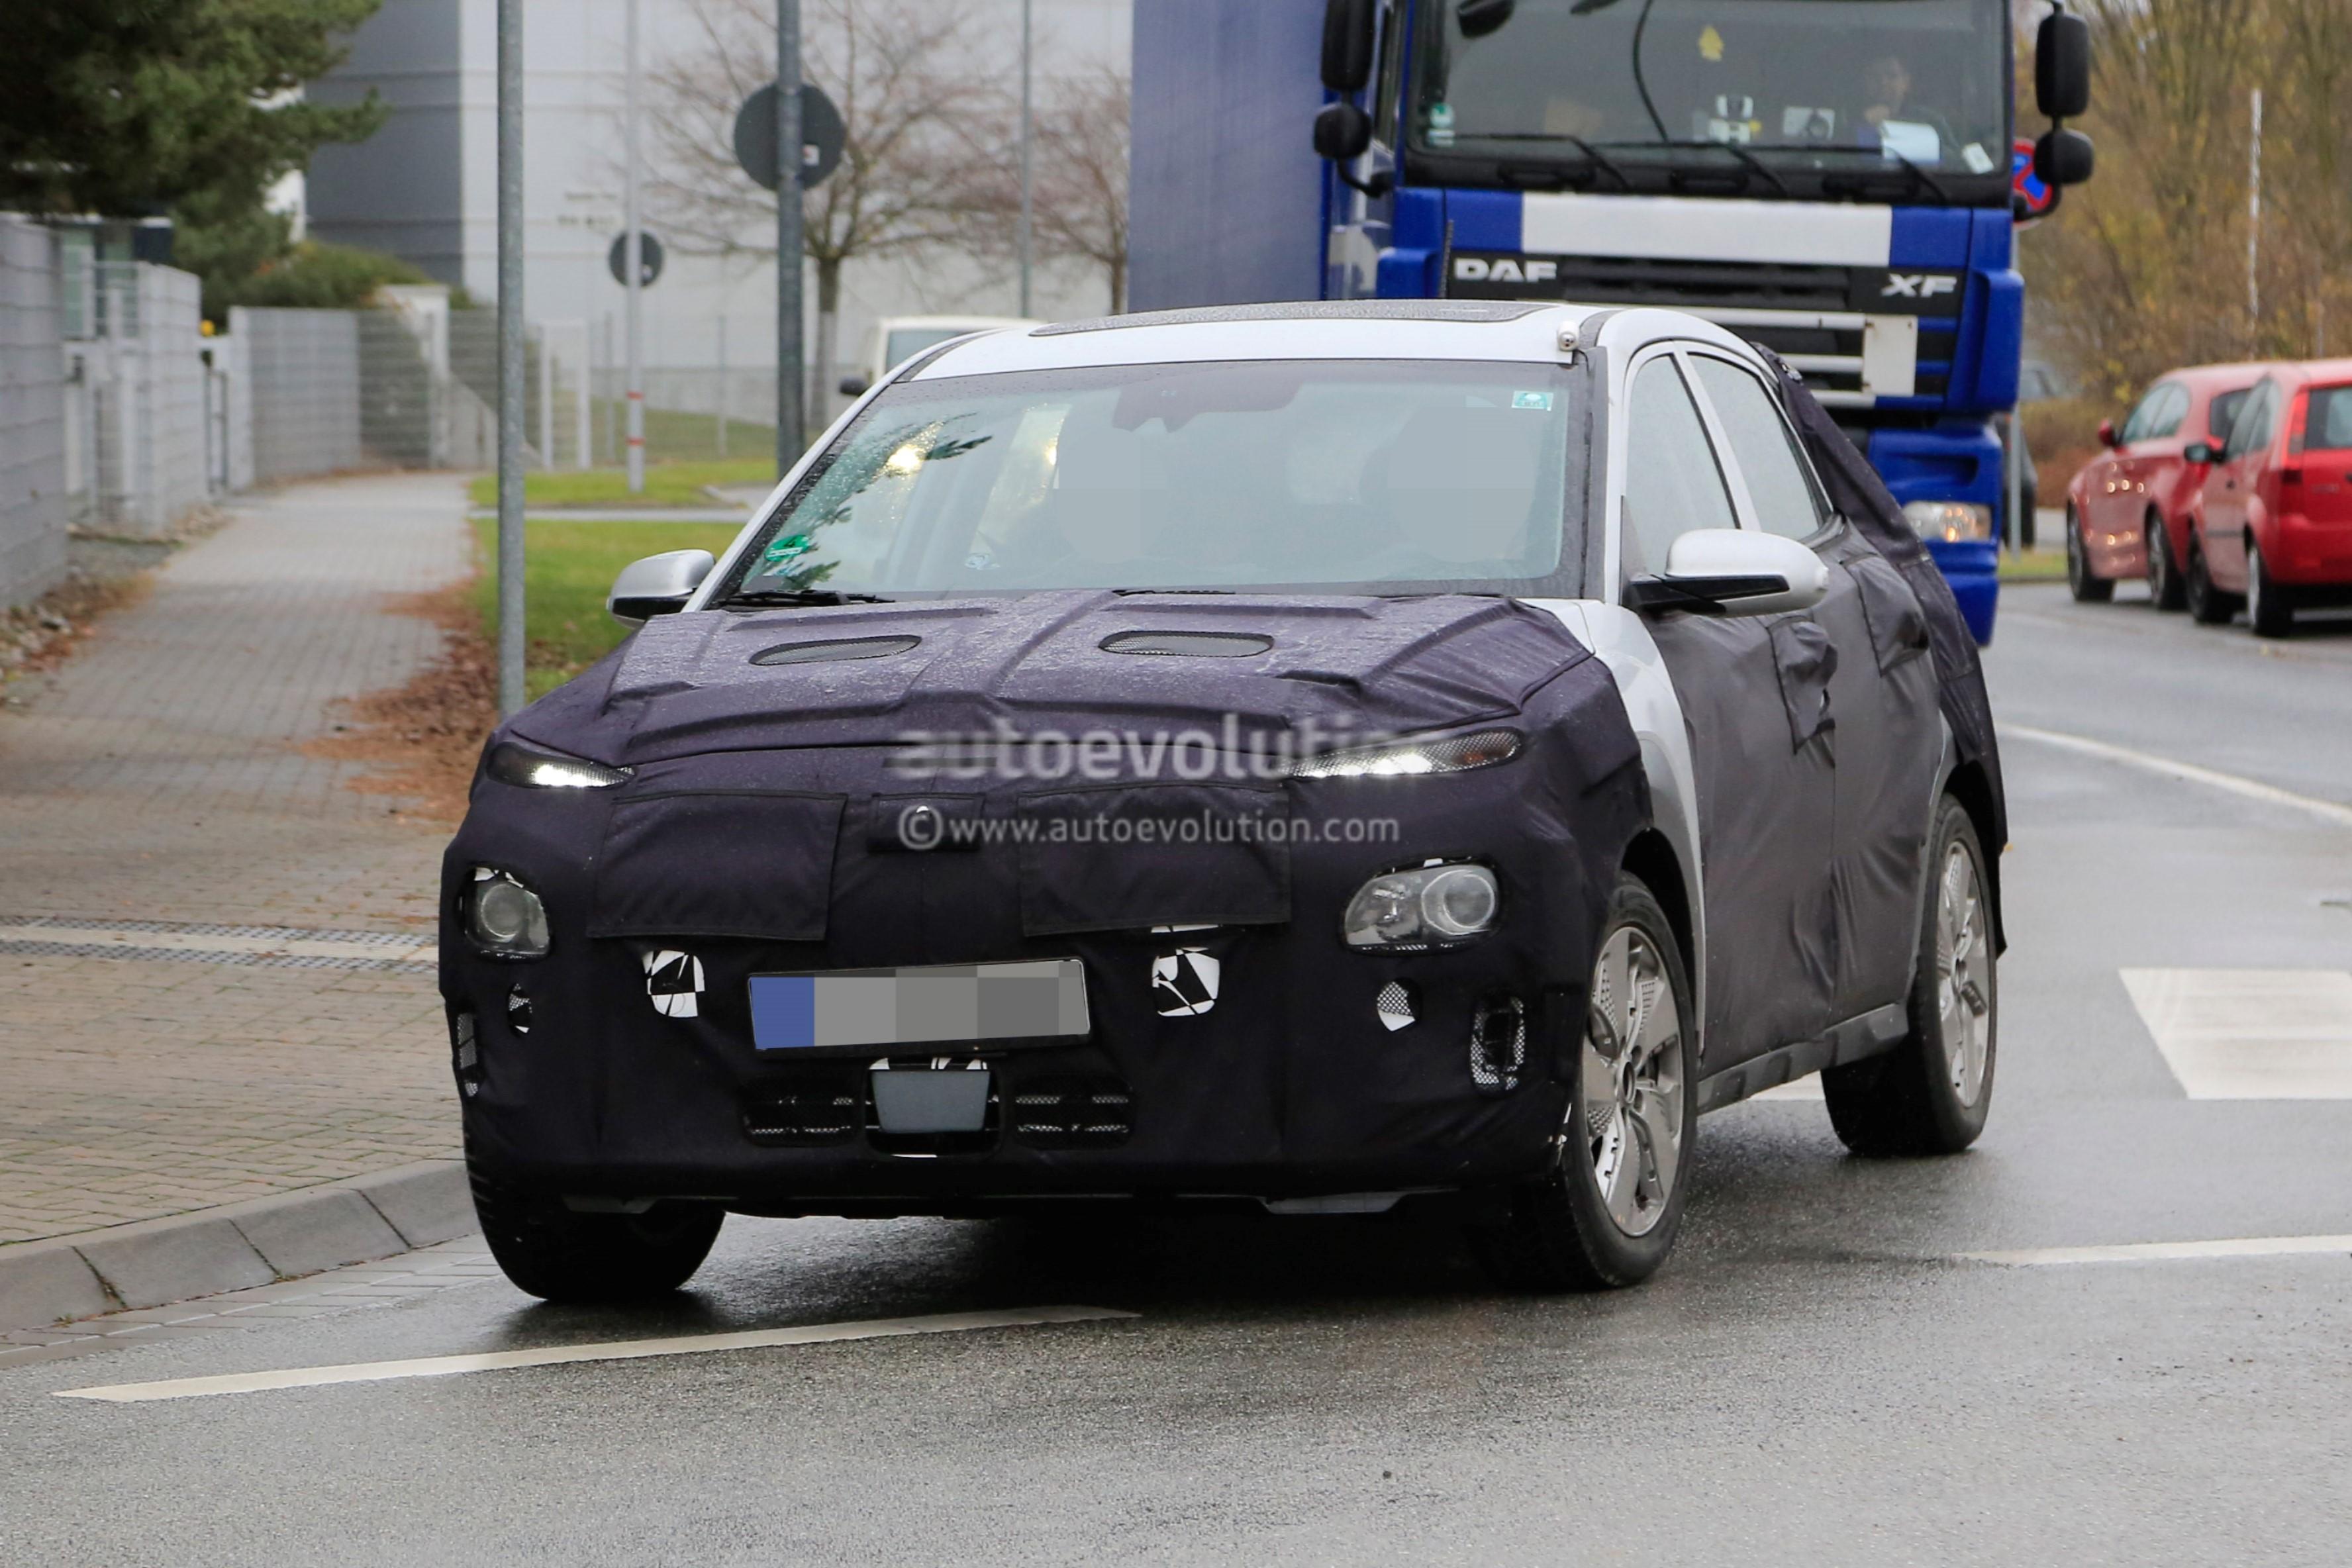 Spyshots: 2018 Hyundai Kona Electric SUV Caught Testing In ...